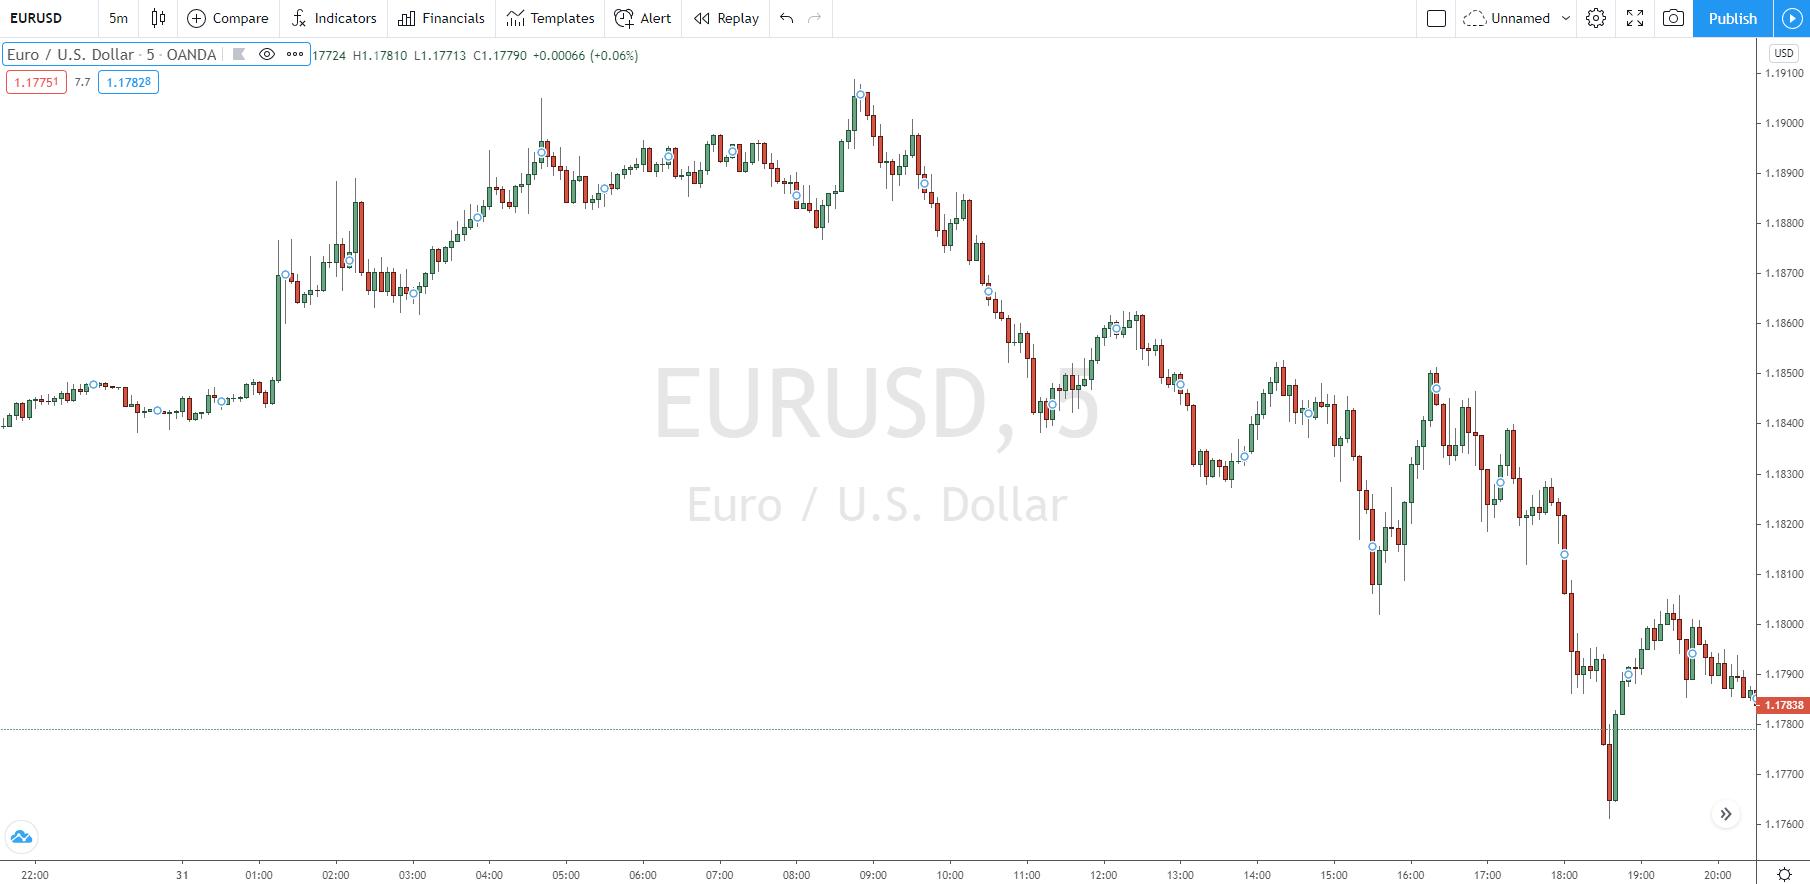 Klares Preisdiagramm für Price Action Trading